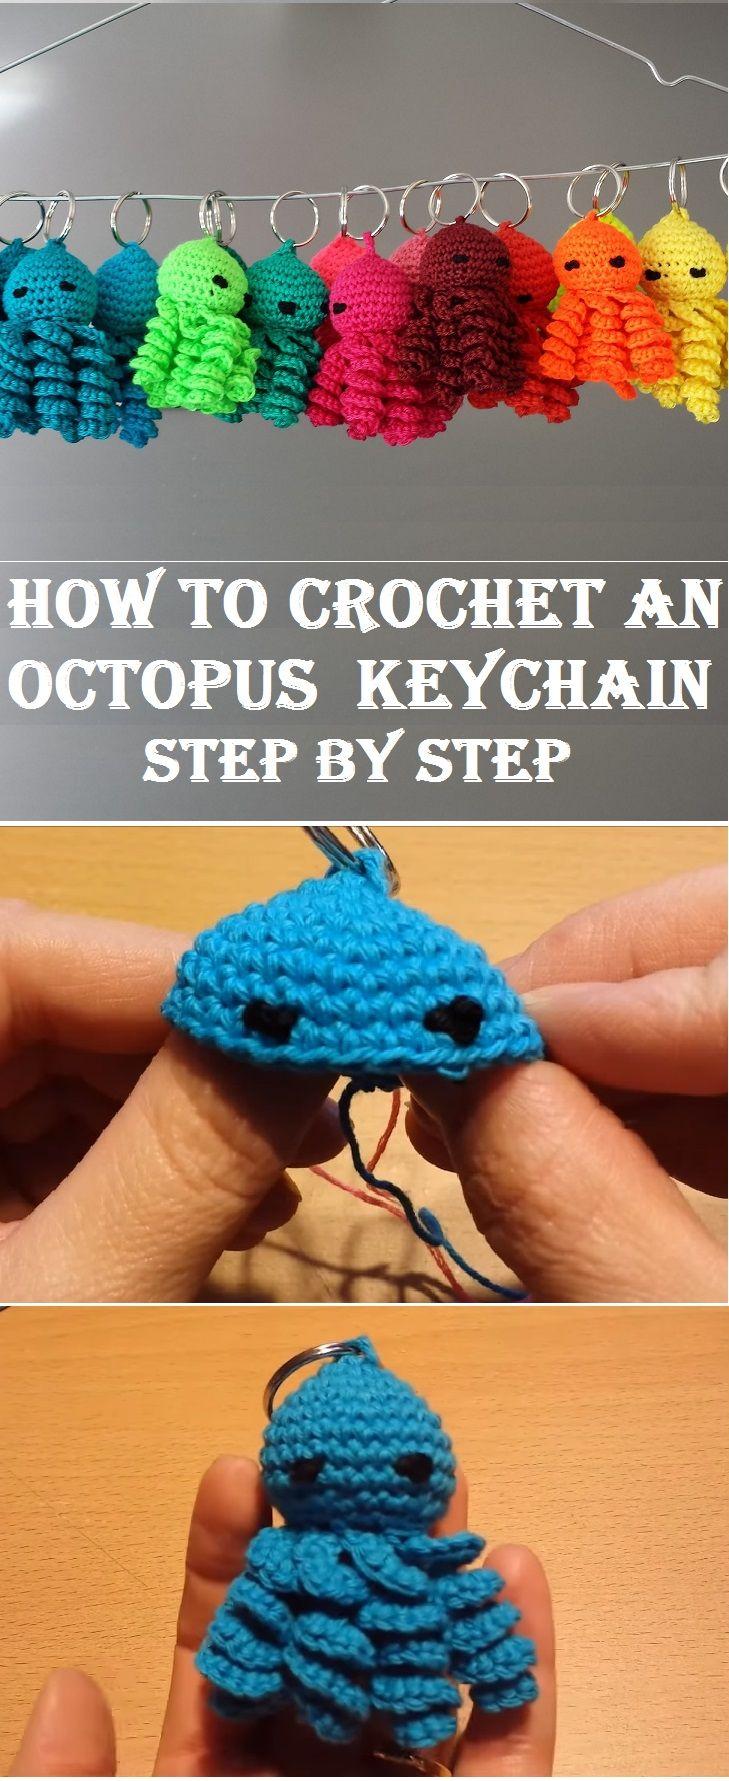 How to Crochet an Octopus Keychain Tutorial